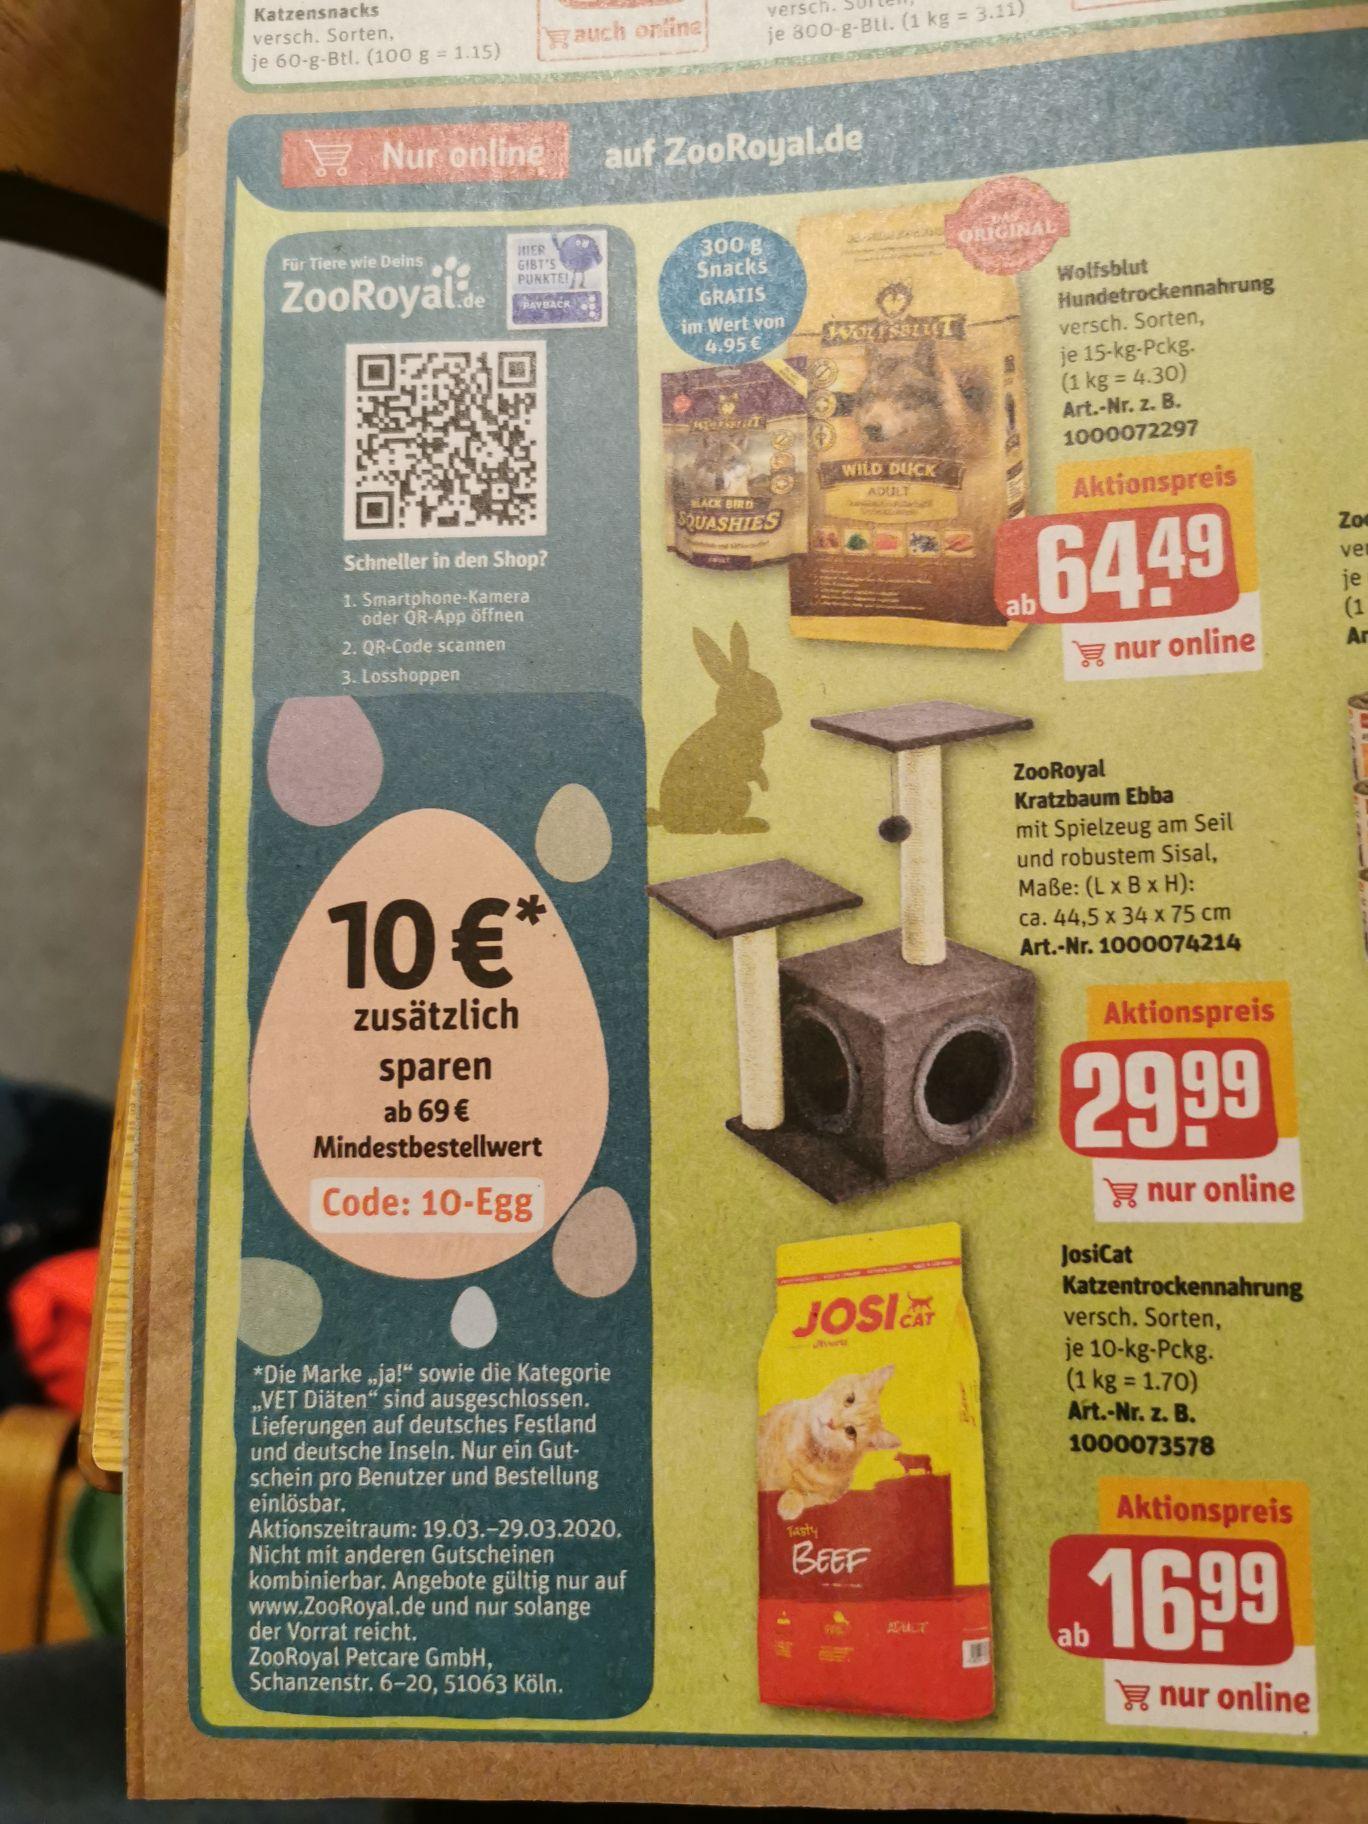 10 Euro Rabatt bei Zooroyal ab 69 Euro Mindestbestellwert